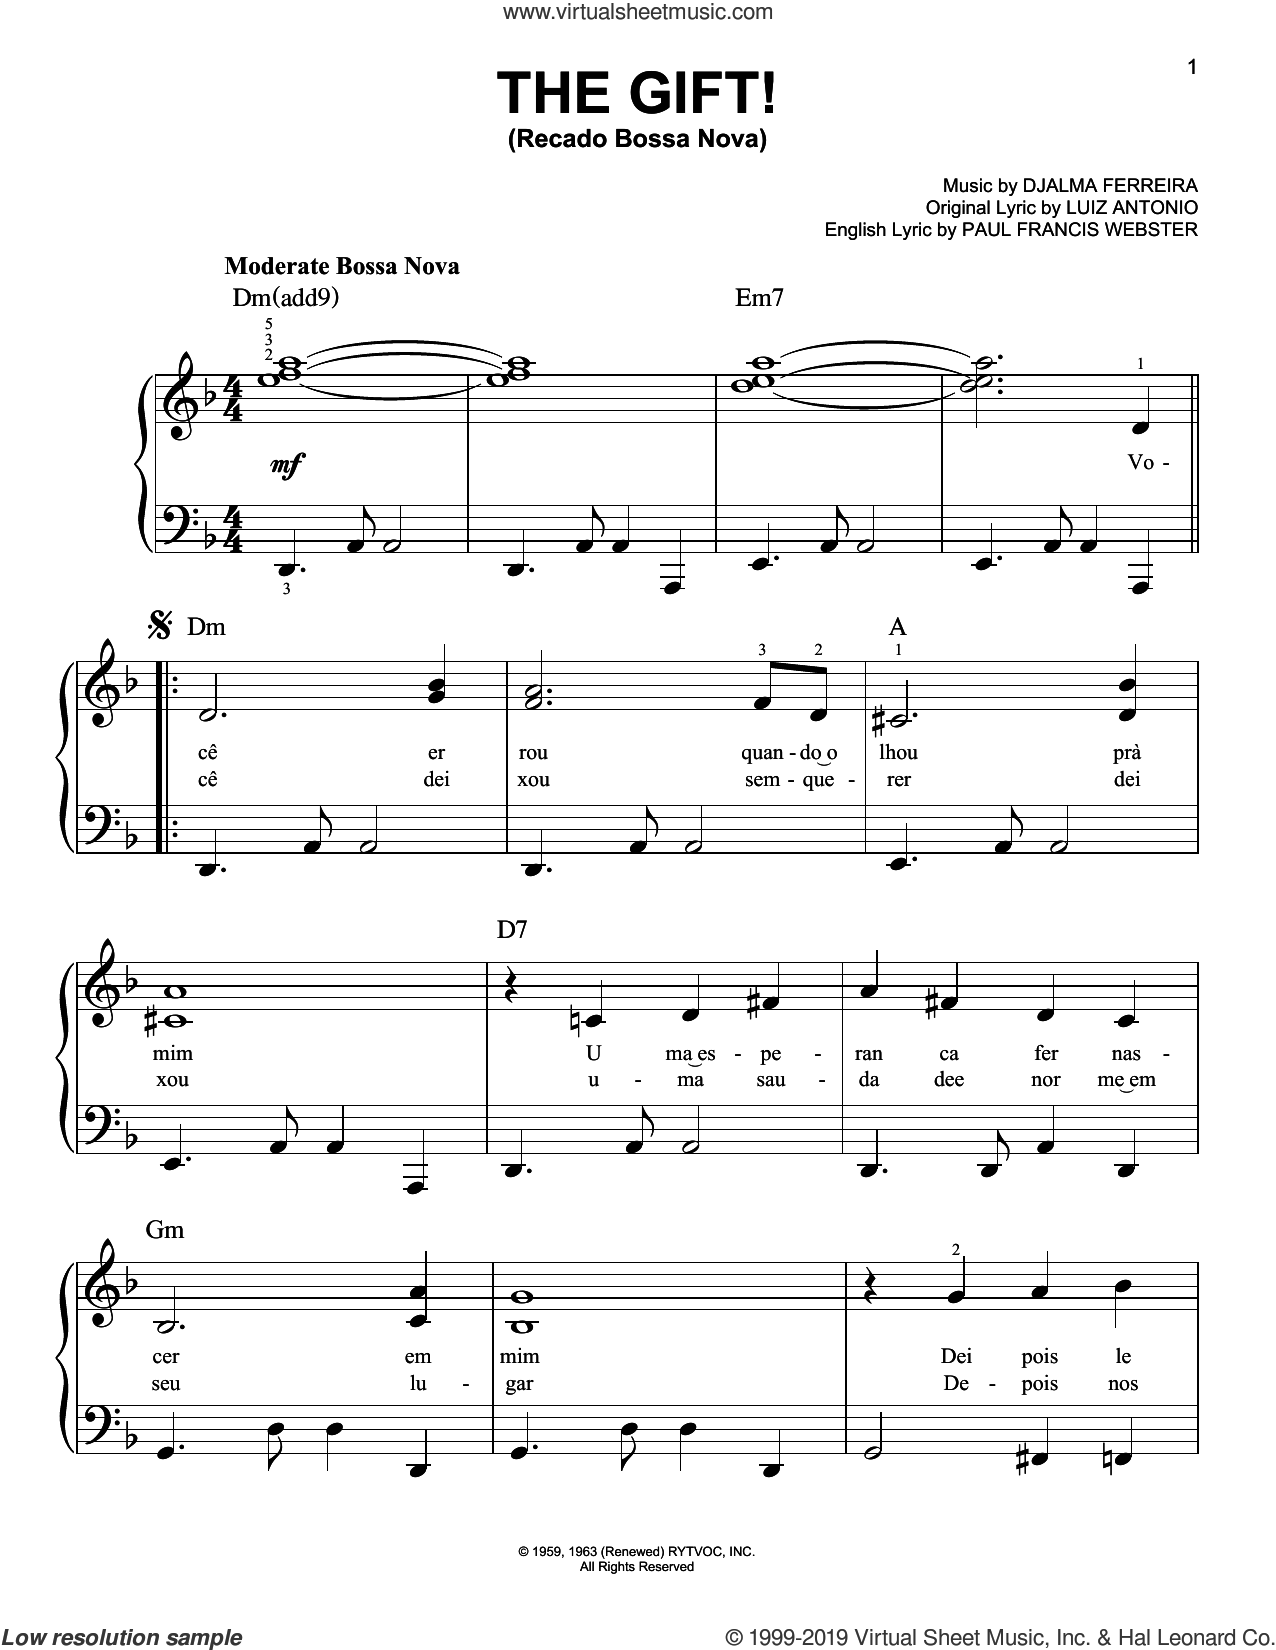 The Gift! (Recado Bossa Nova) sheet music for piano solo by Djalma Ferreira, Luiz Antonio and Paul Francis Webster, beginner skill level